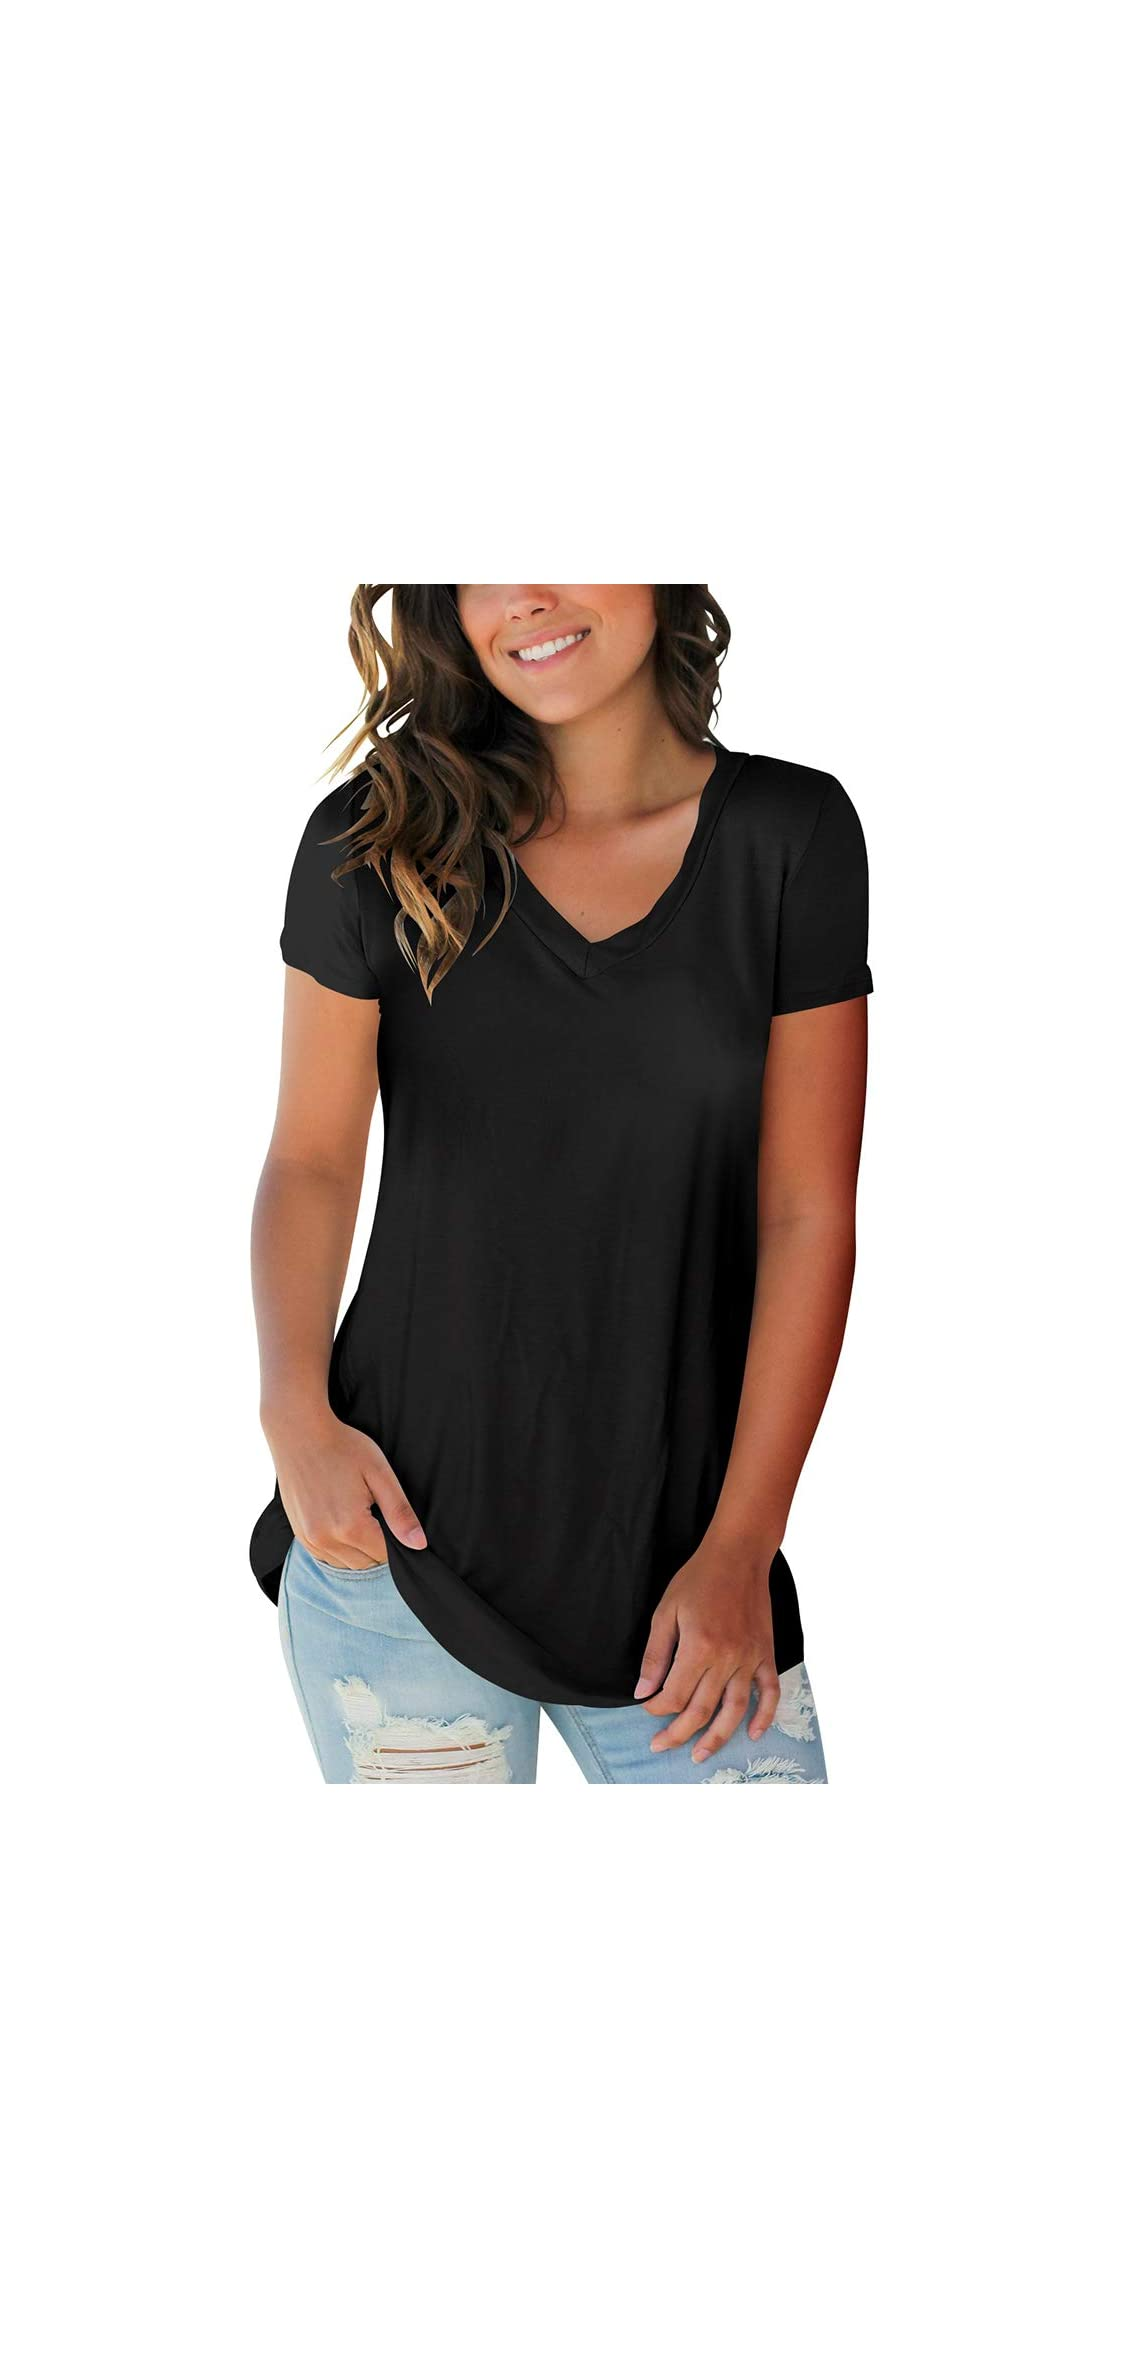 Women's Basic V Neck Short Sleeve T Shirts Summer Casual